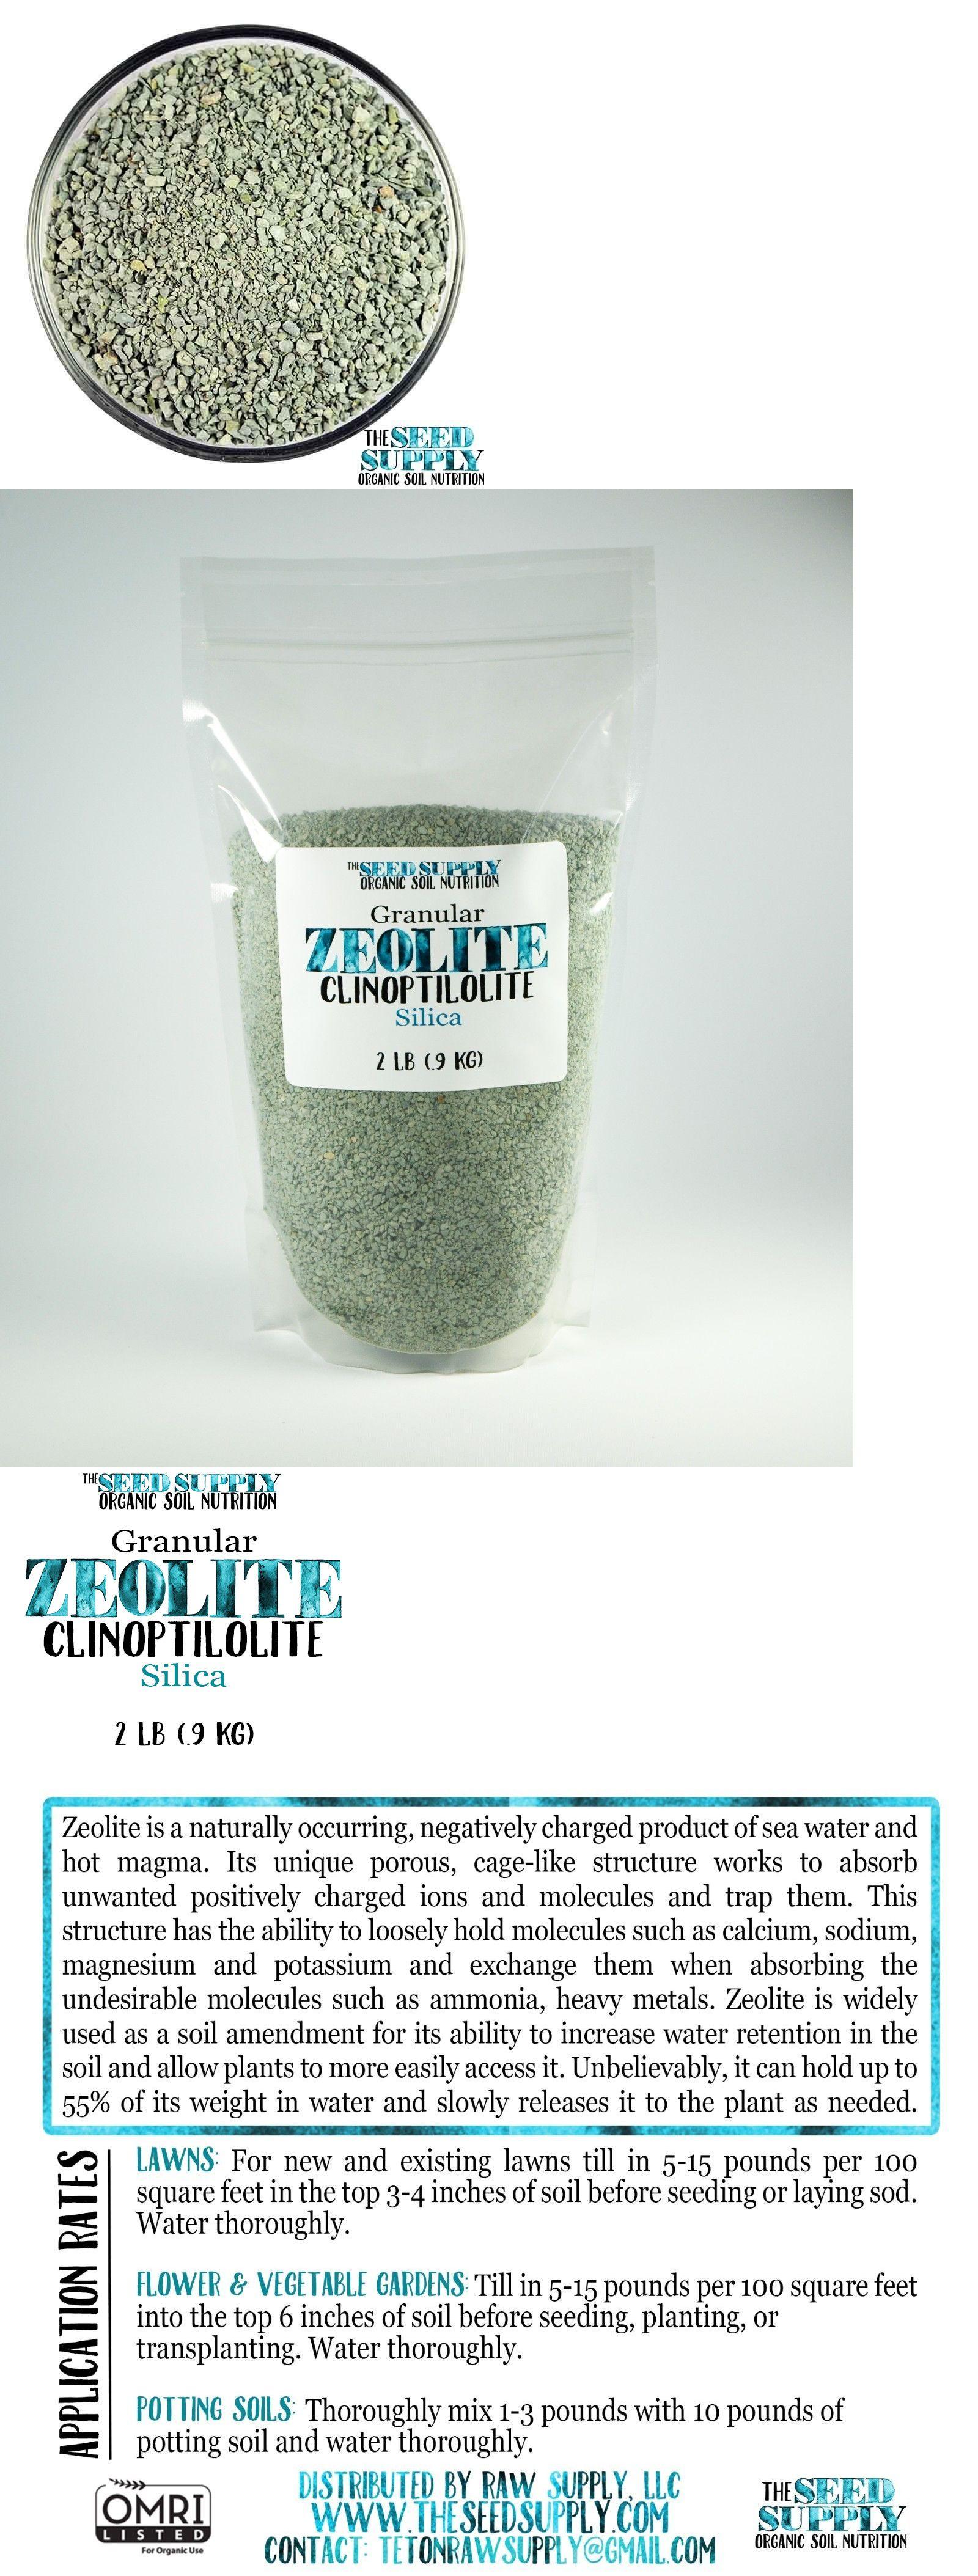 Soil And Soil Amendments 159406 2 Pound Granular Clinoptilolite